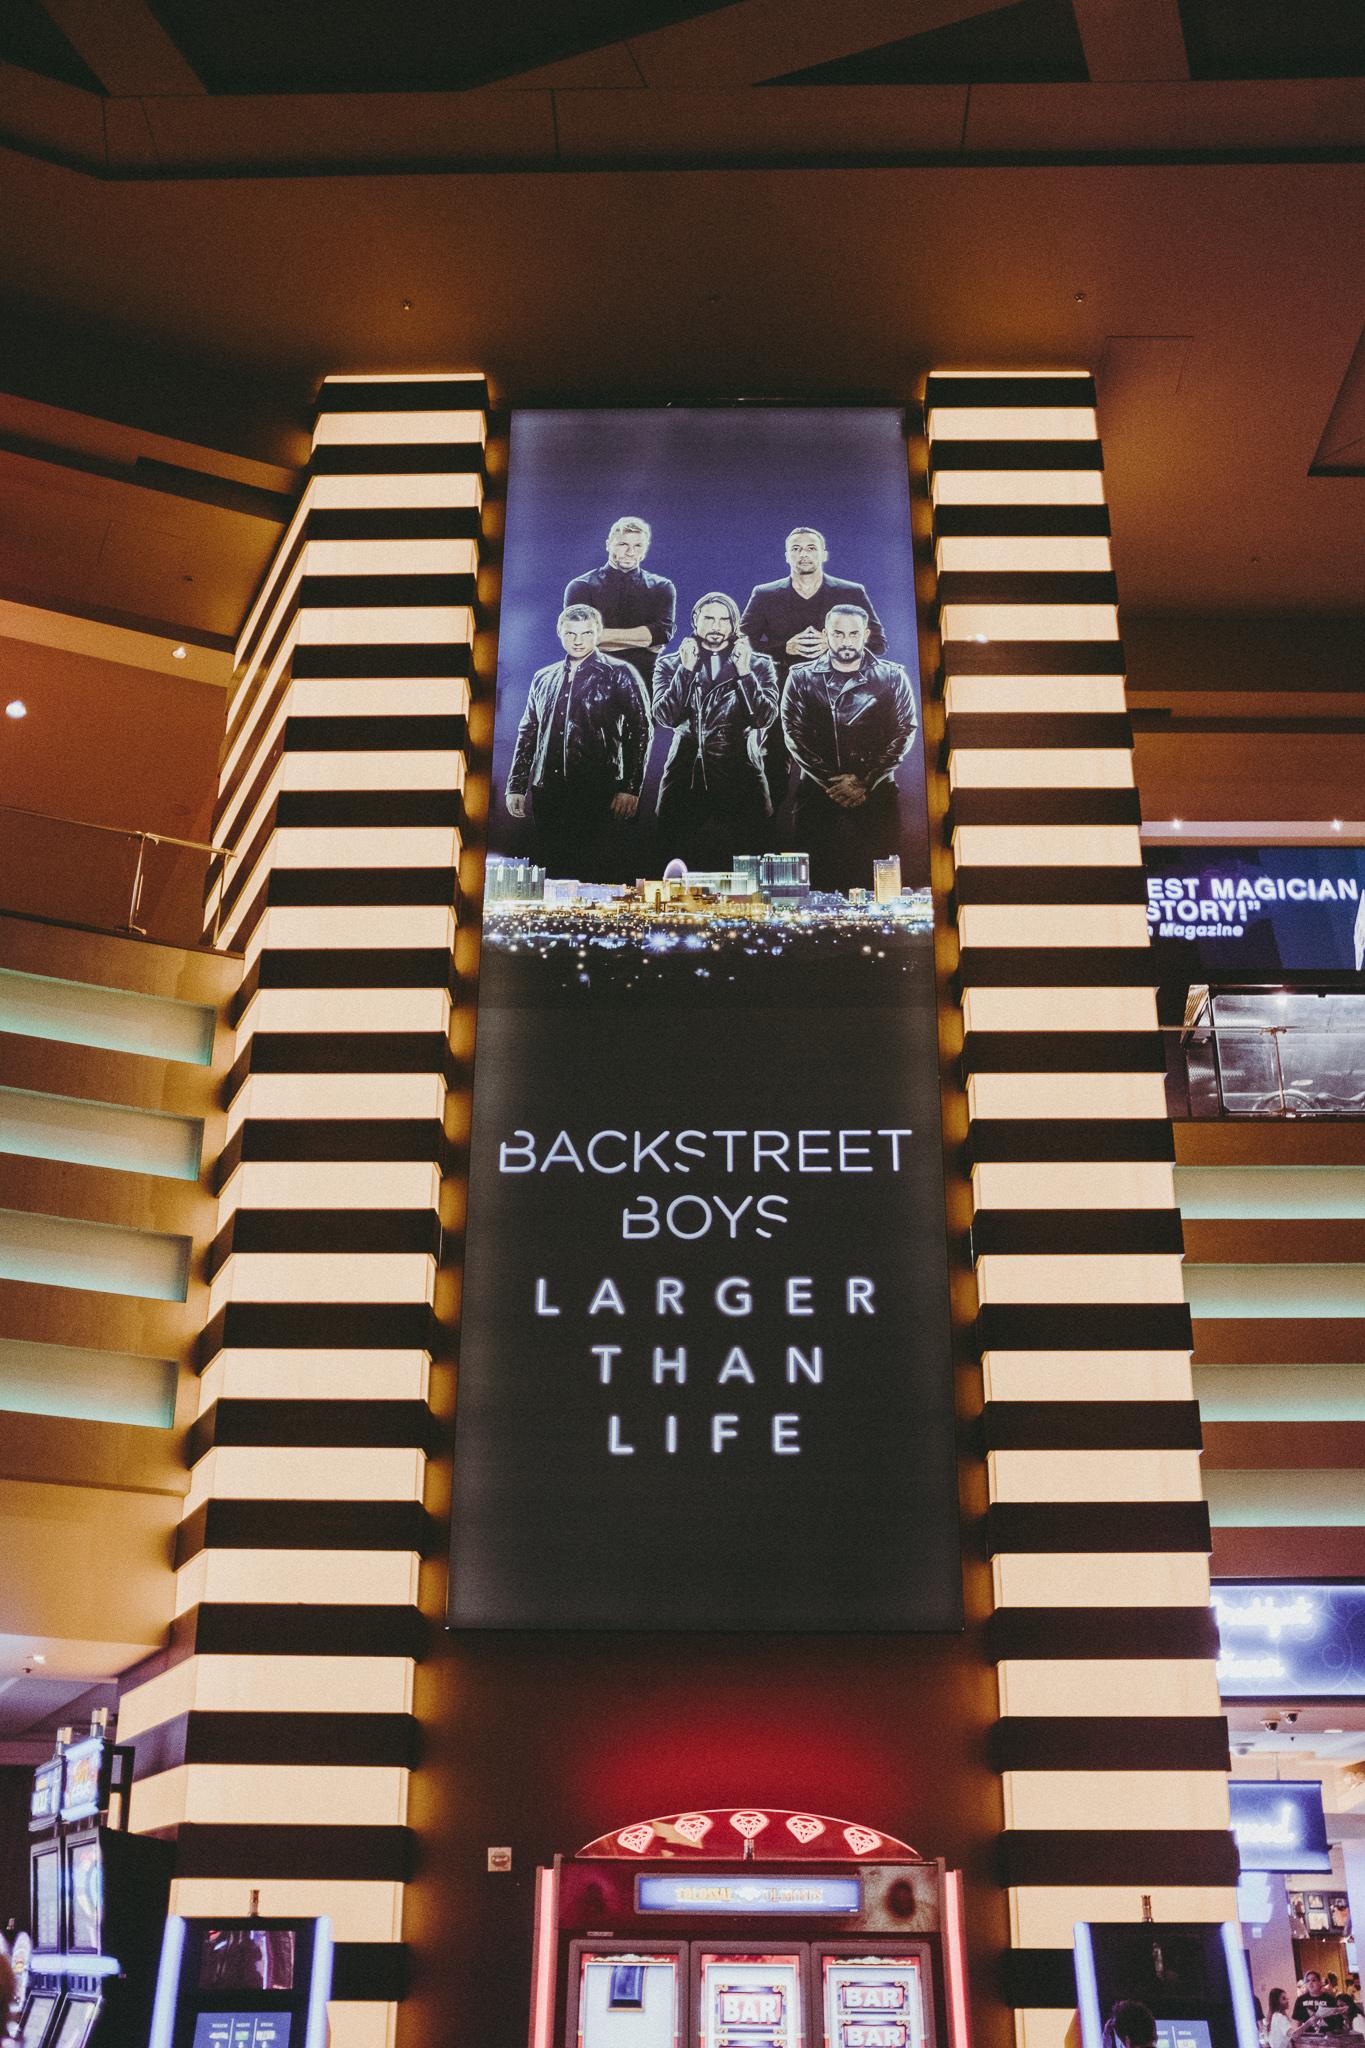 Backstreets back (alright!) 🕺🕺🕺🕺🕺